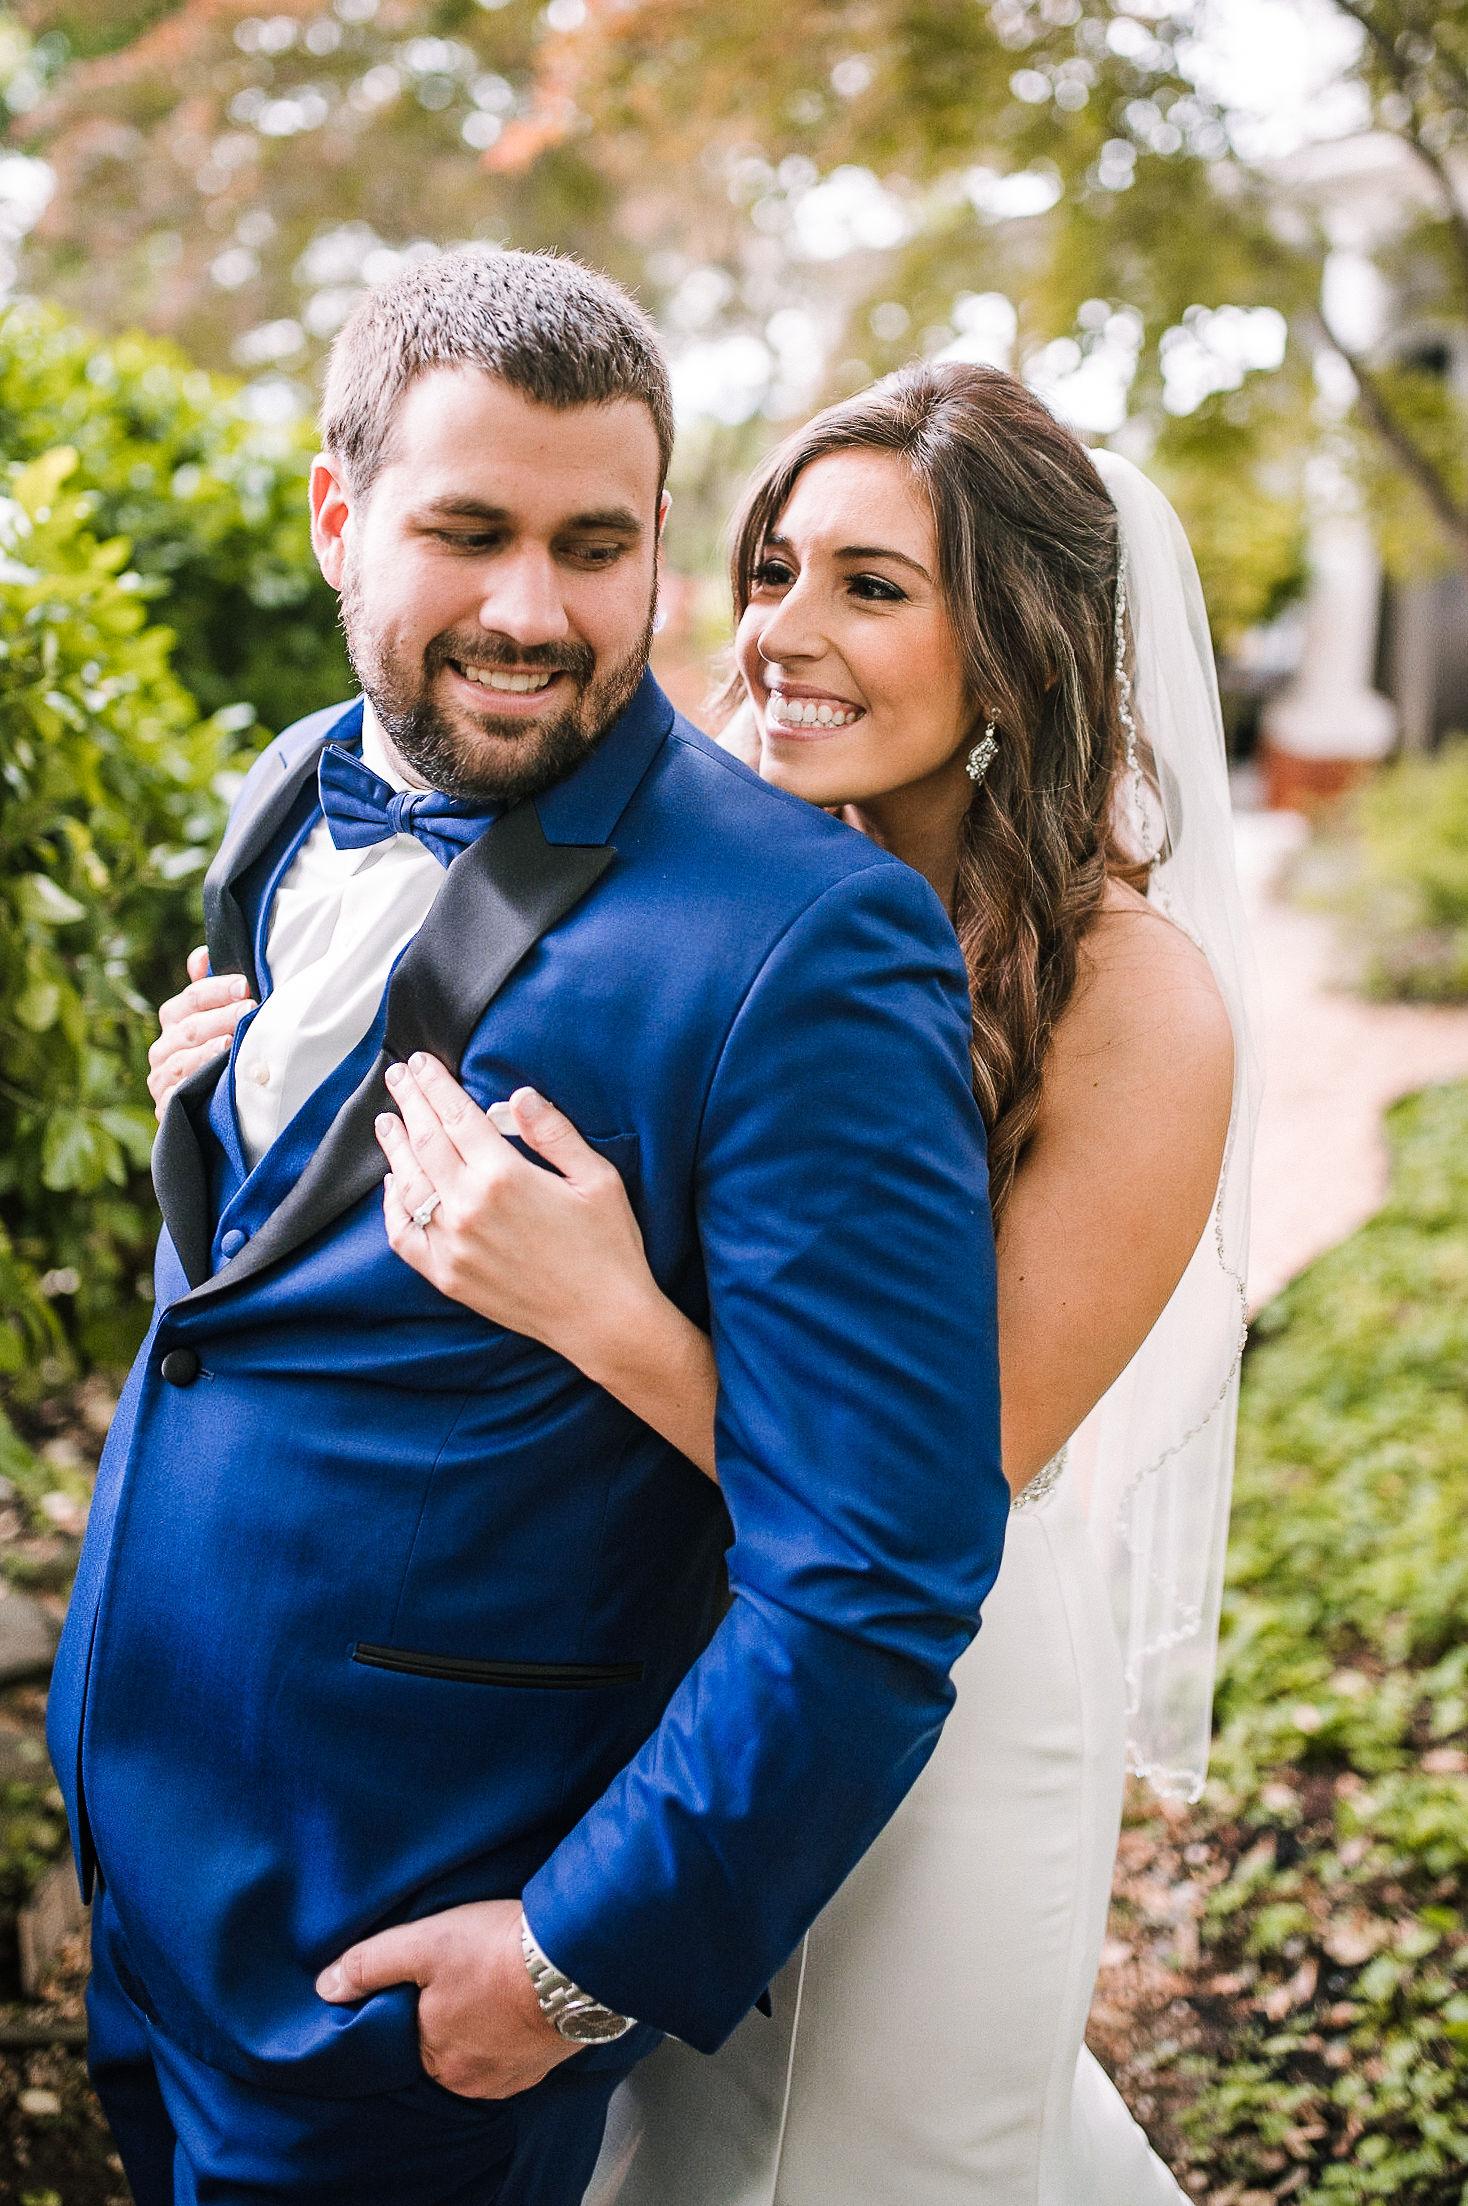 bride and groom smiling and embracing at Seasons at Magnolia Manor